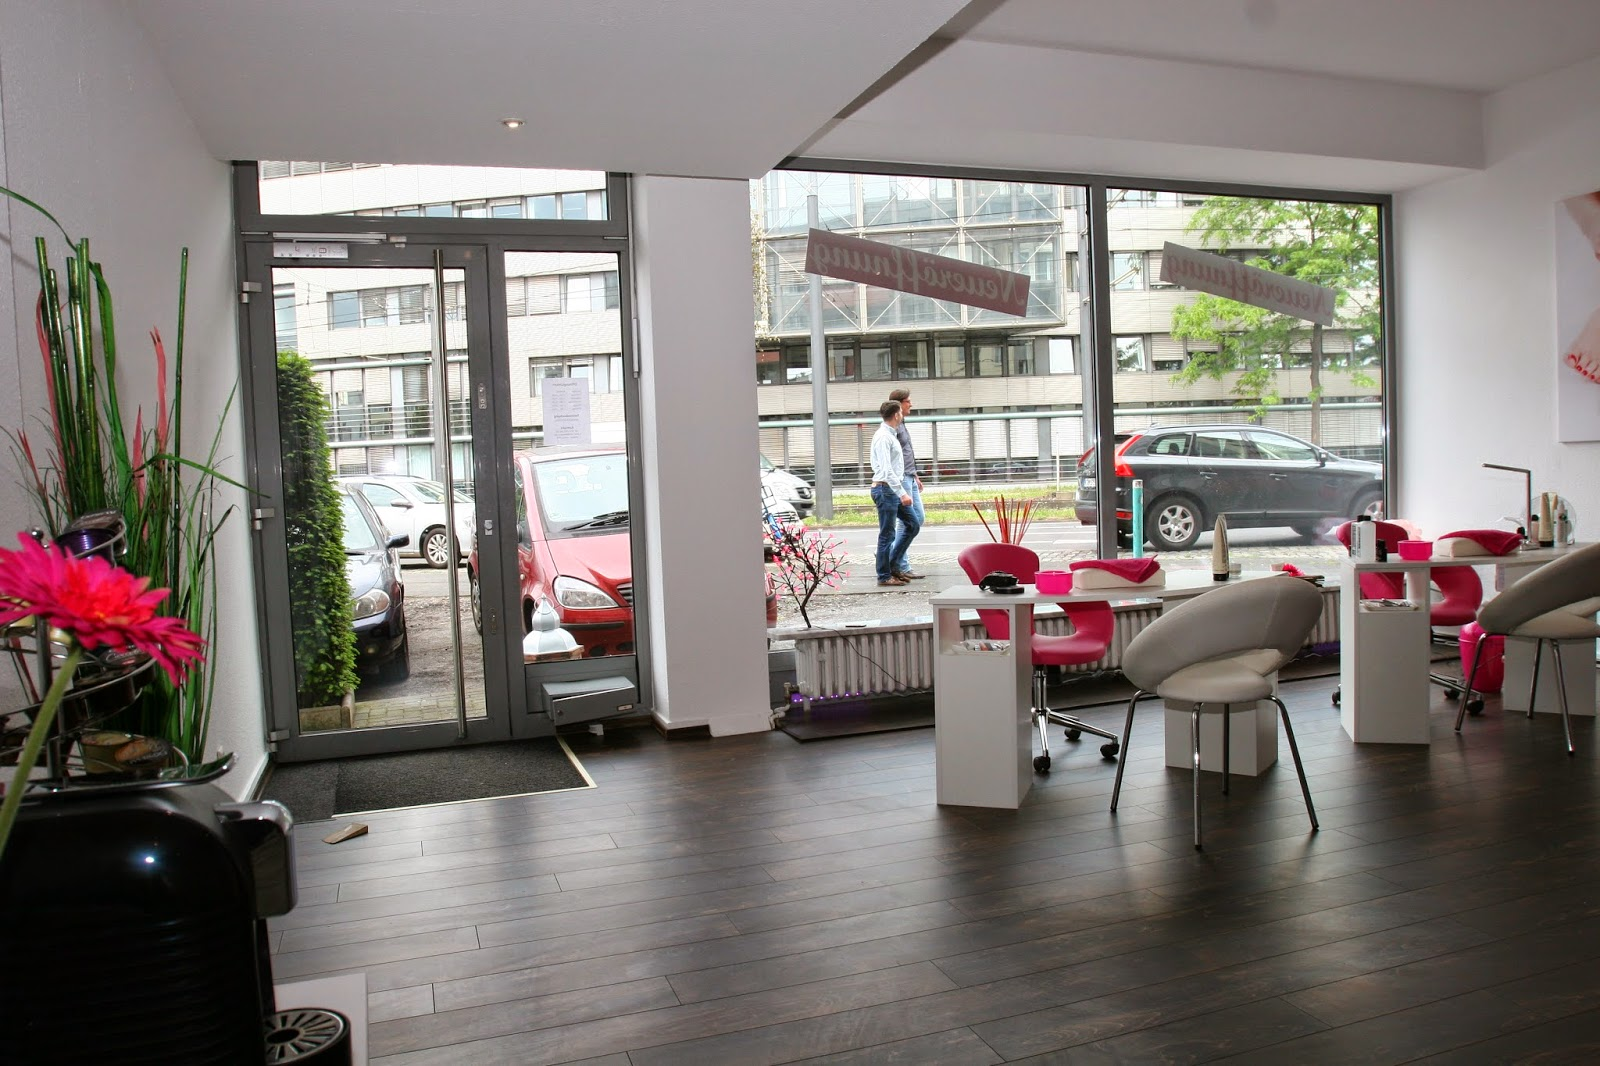 Nett Büromöbel Wuppertal Galerie - Das Beste Architekturbild ...